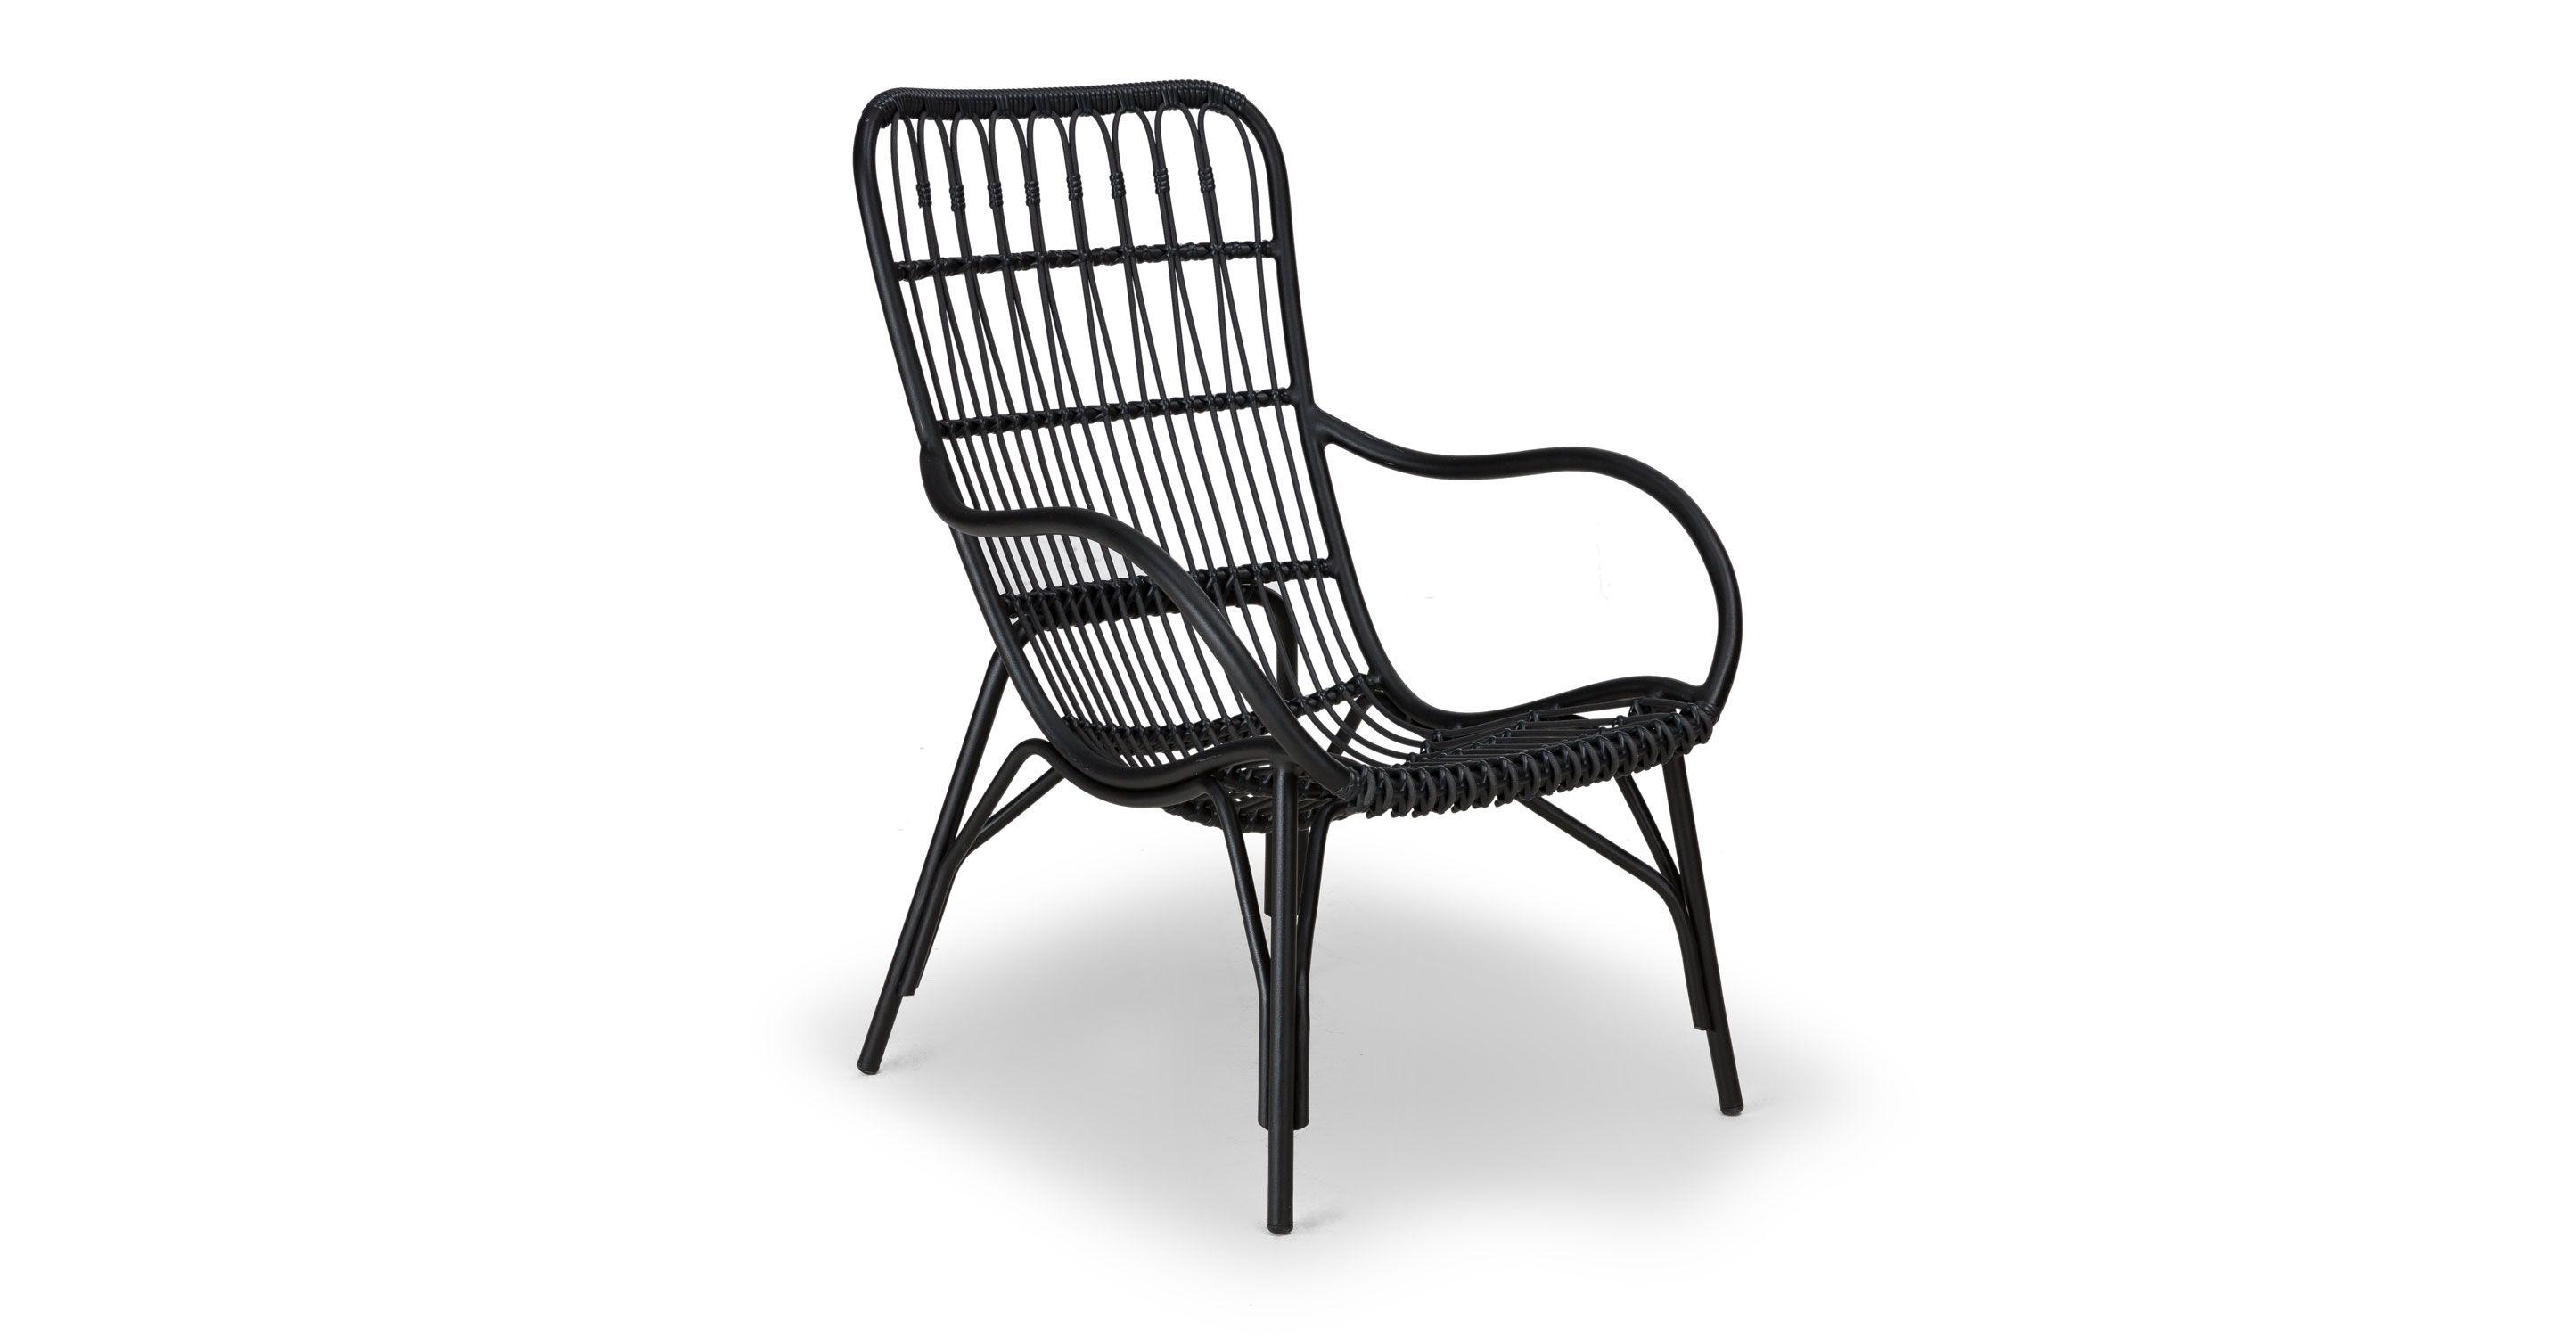 Medan Graphite Lounge Chair Lounge Chair Outdoor Modern Outdoor Lounge Chair Contemporary Outdoor Furniture